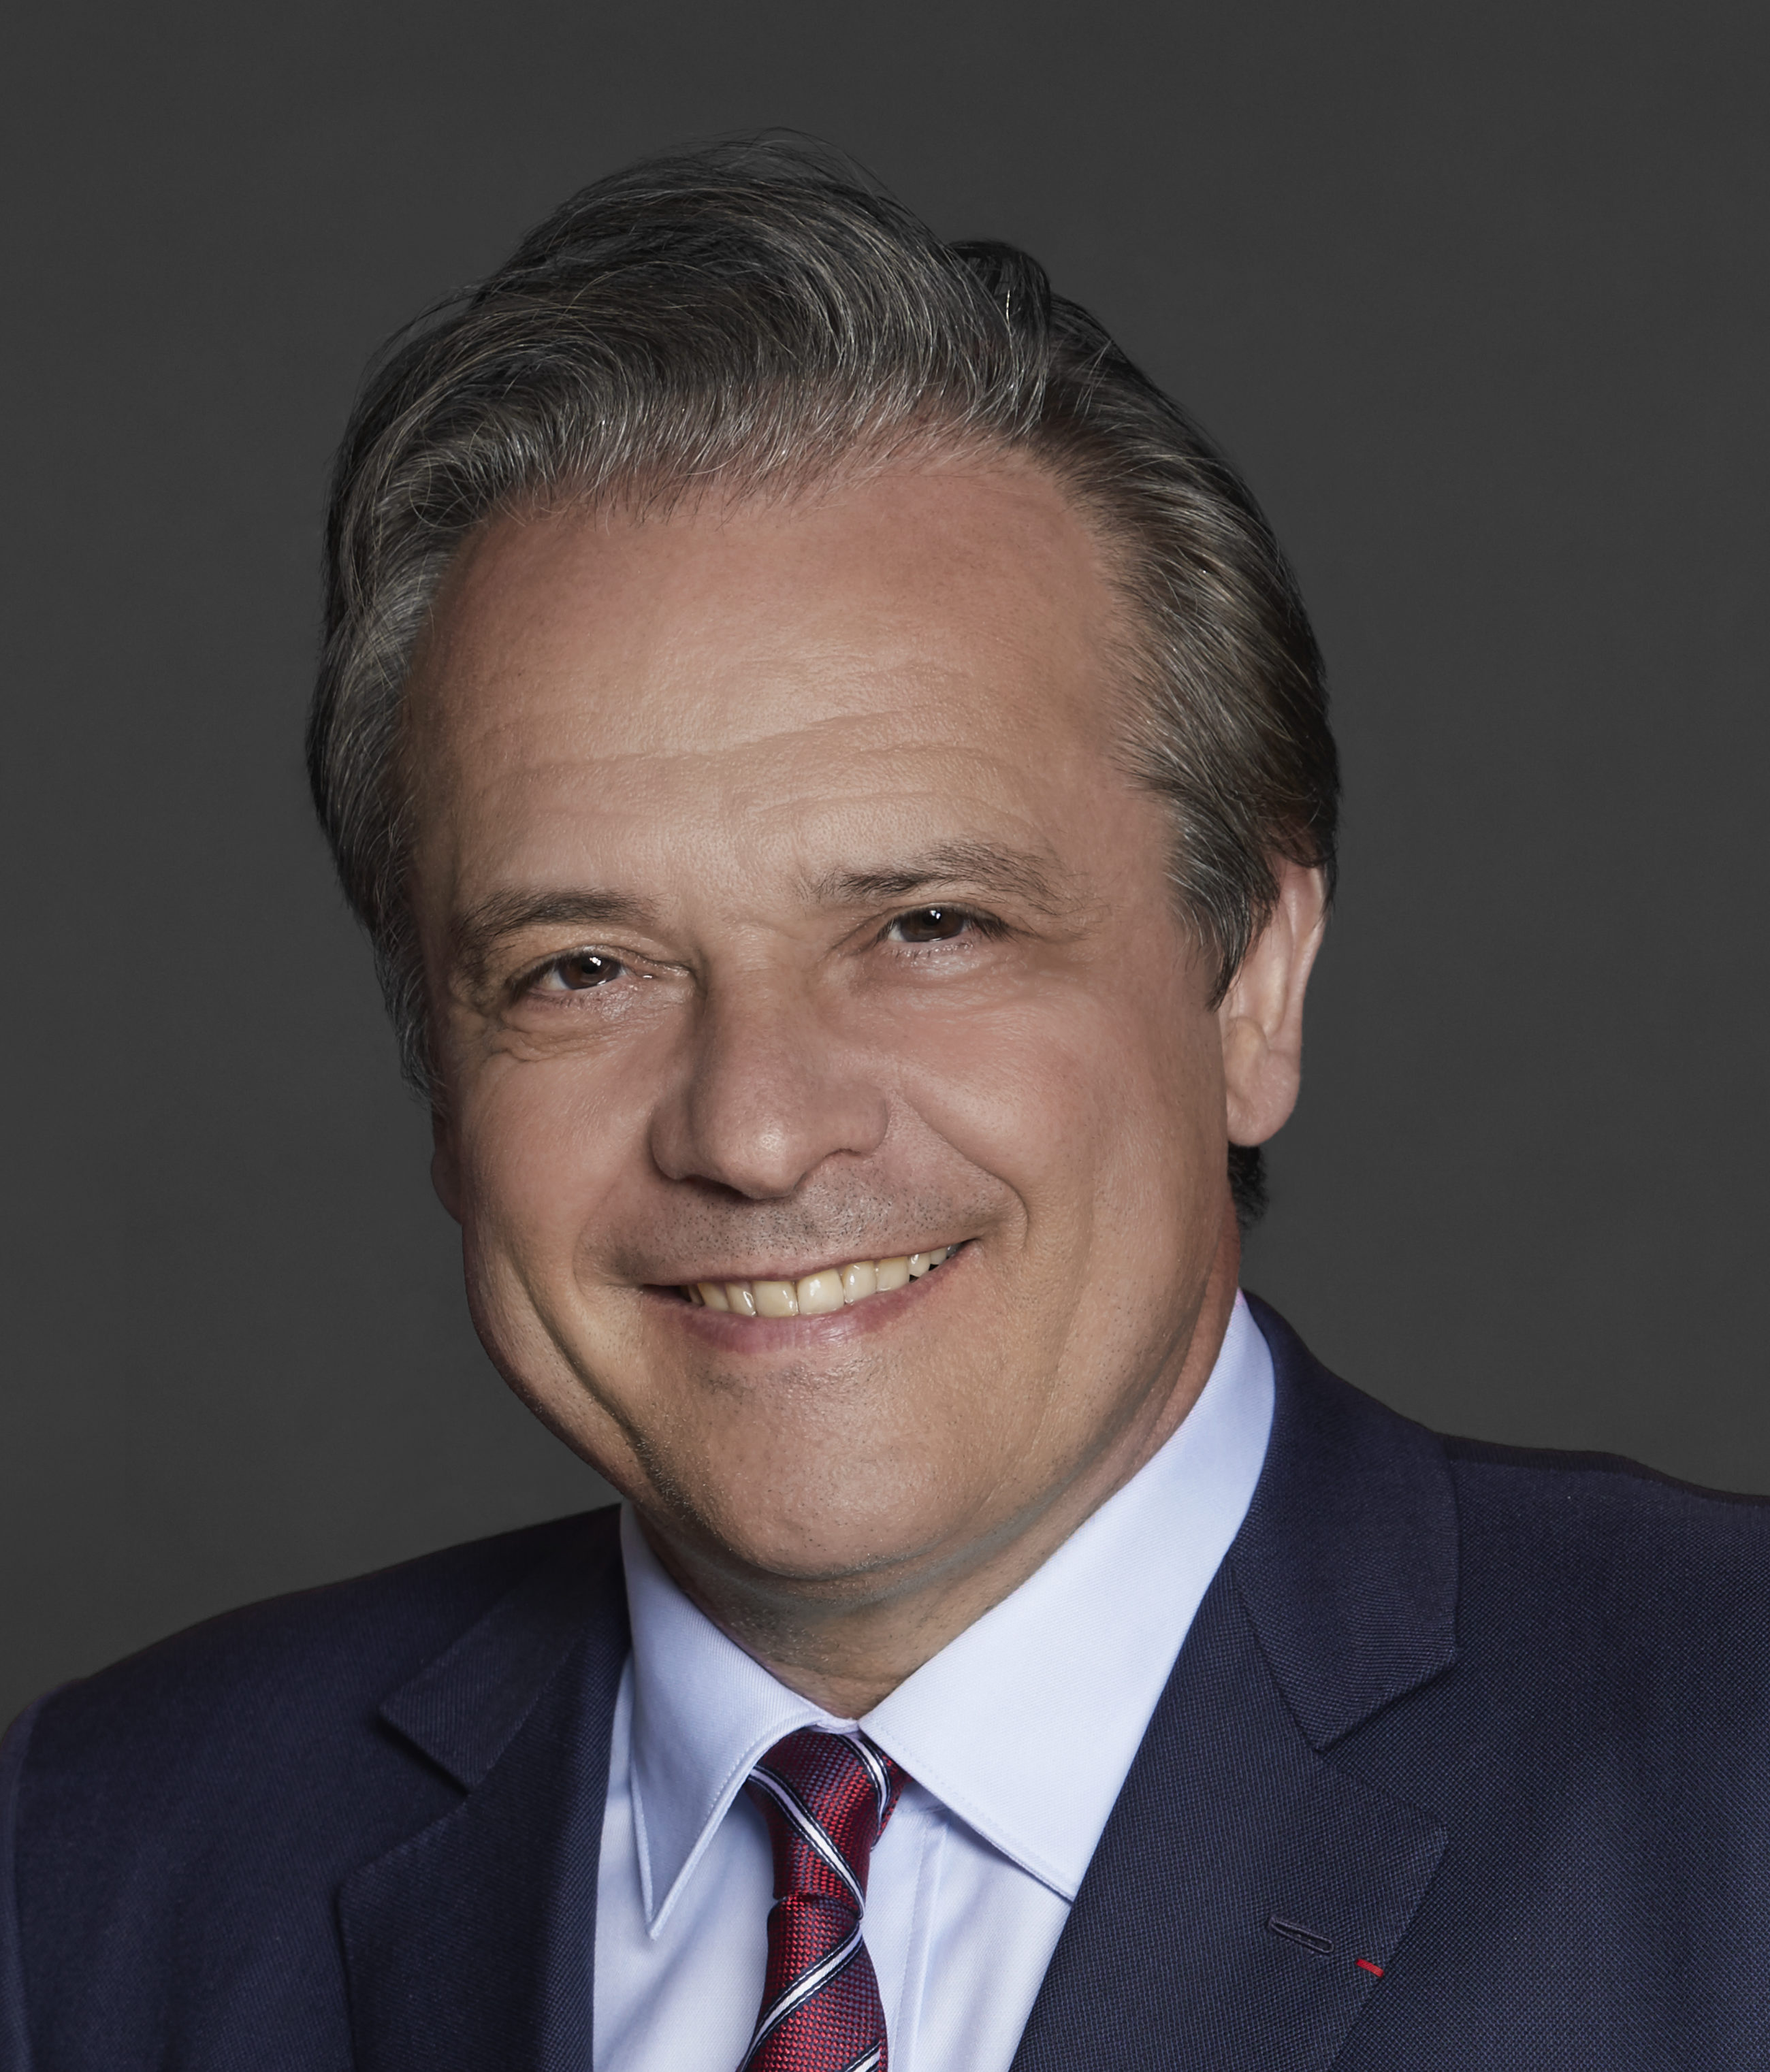 Louis Vogel